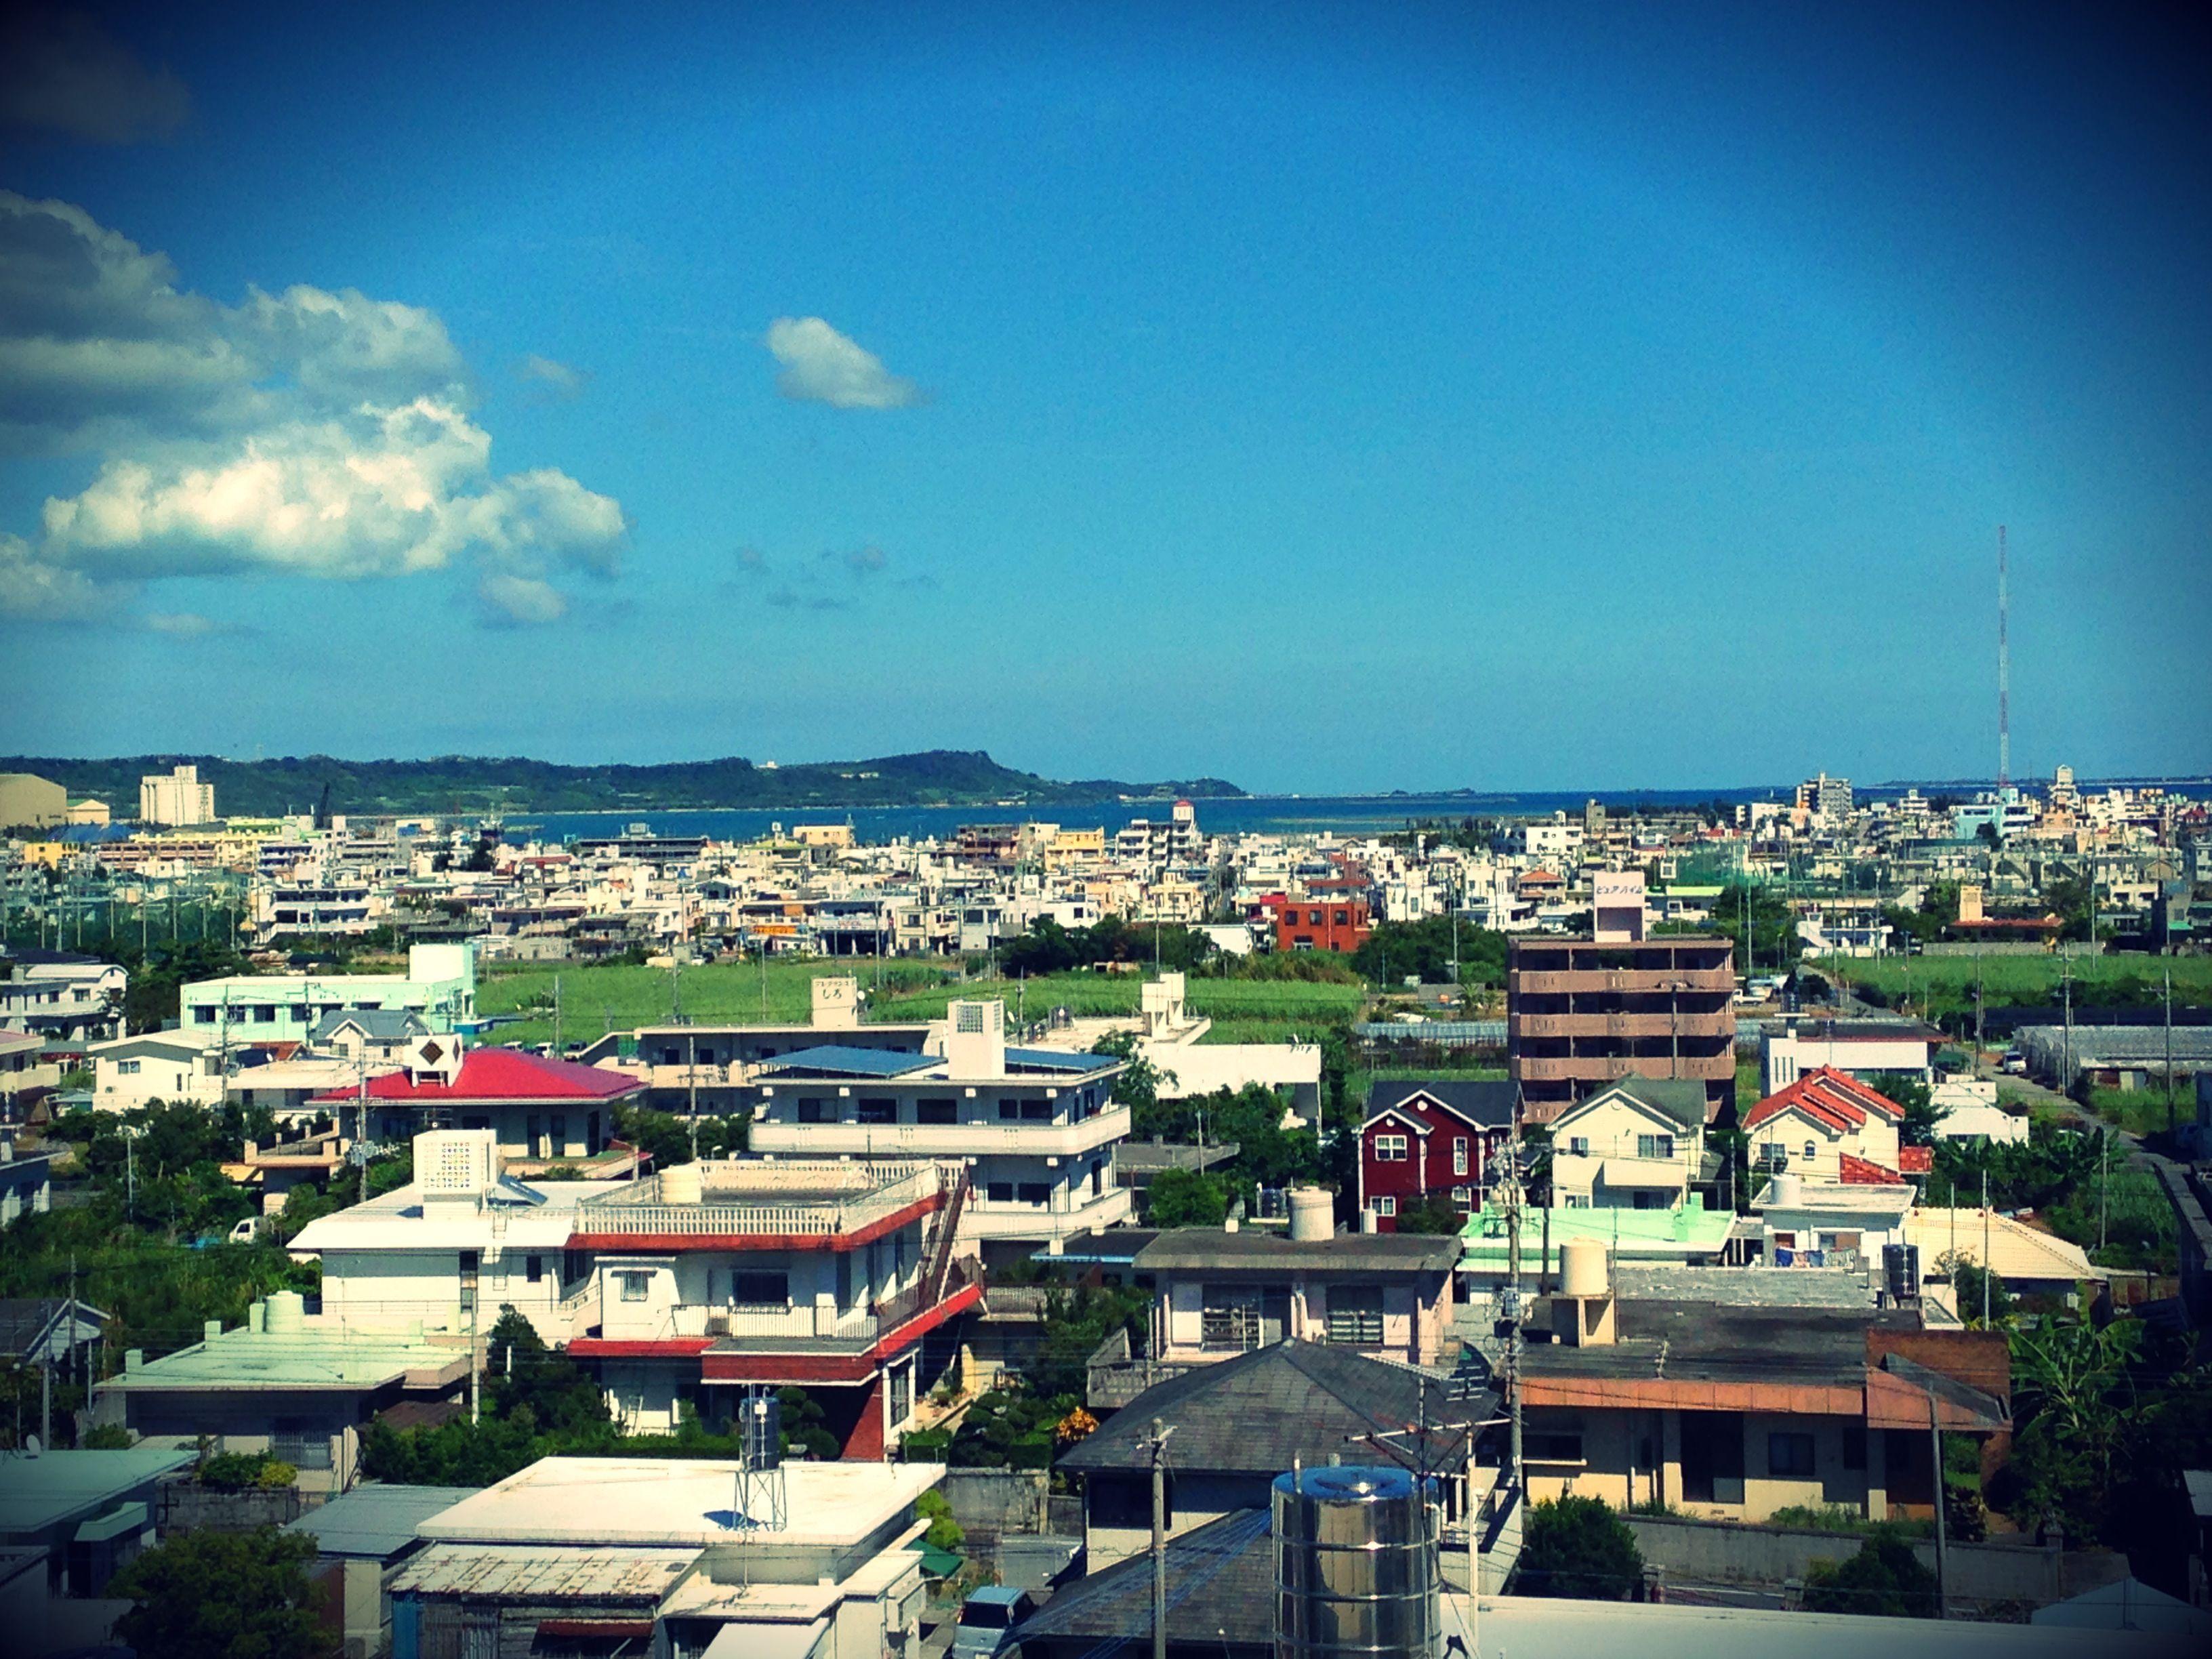 okinawa city okinawa, japan Okinawa Pinterest